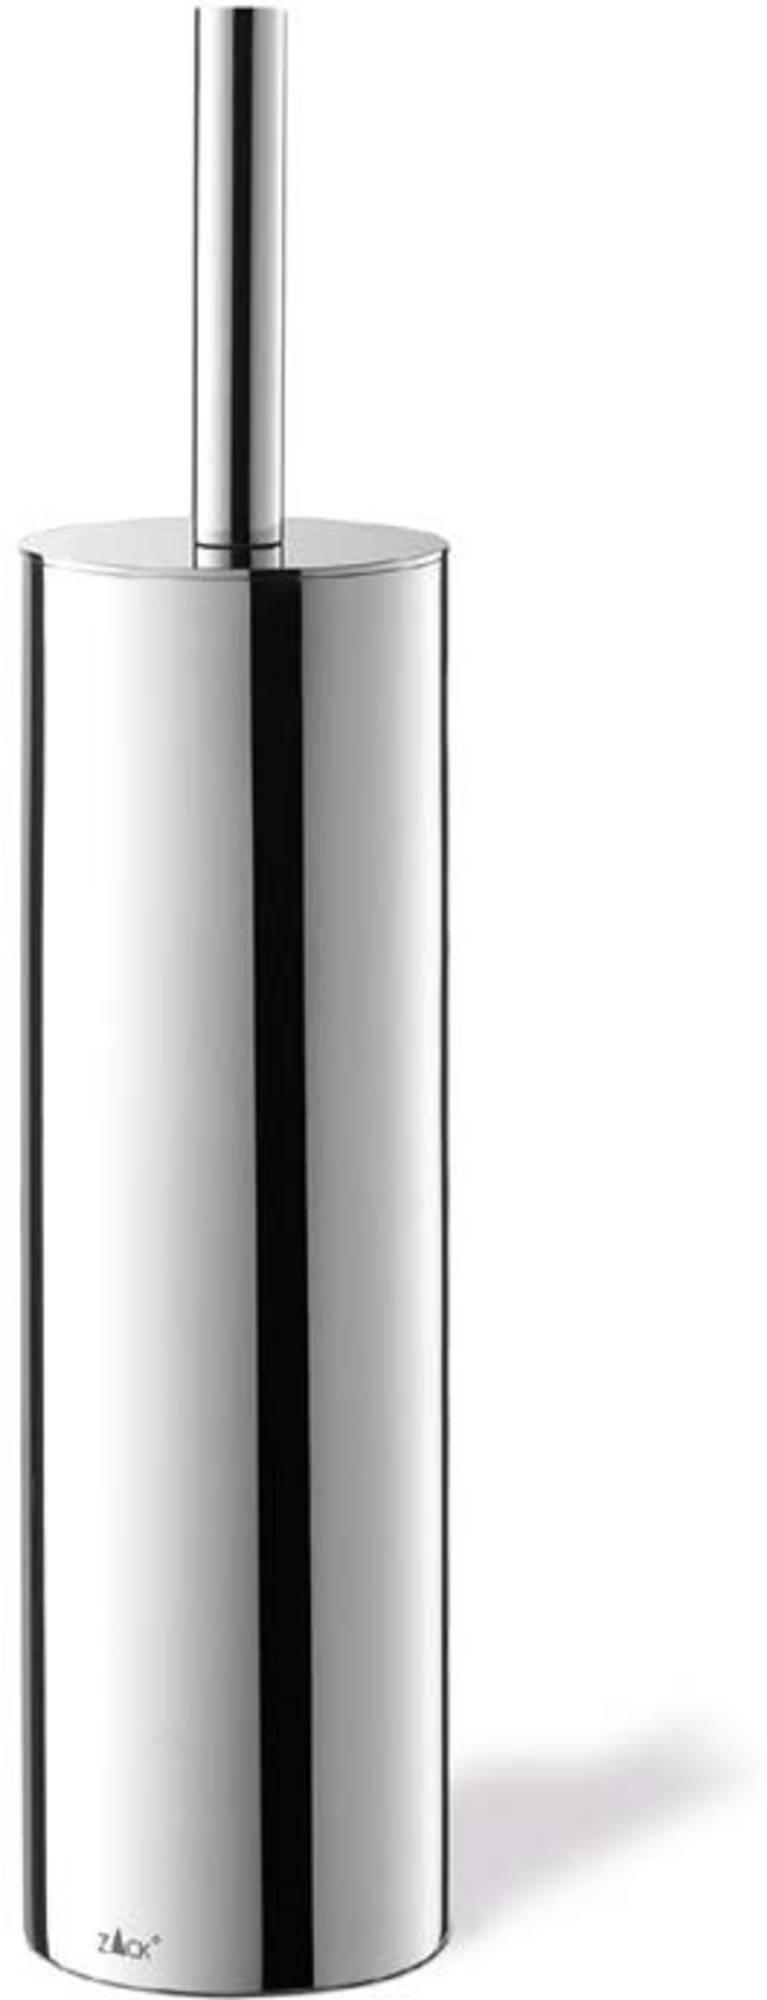 ZACK Tubo Toiletborstel Spiegelglans RVS